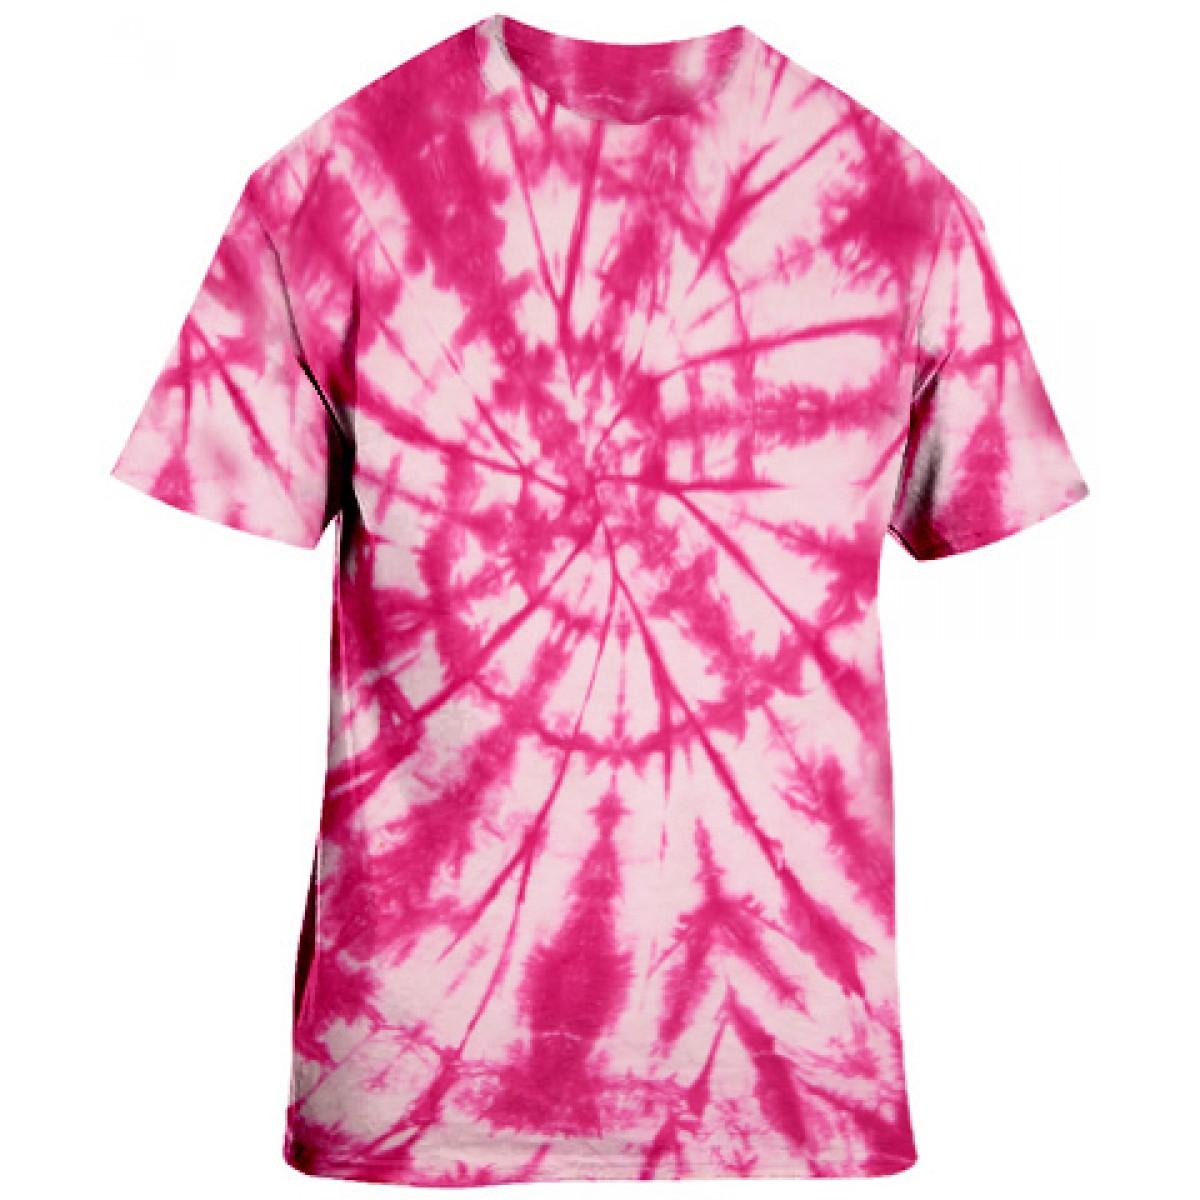 Pink Tie-Dye S/S Tee -Pink-XL